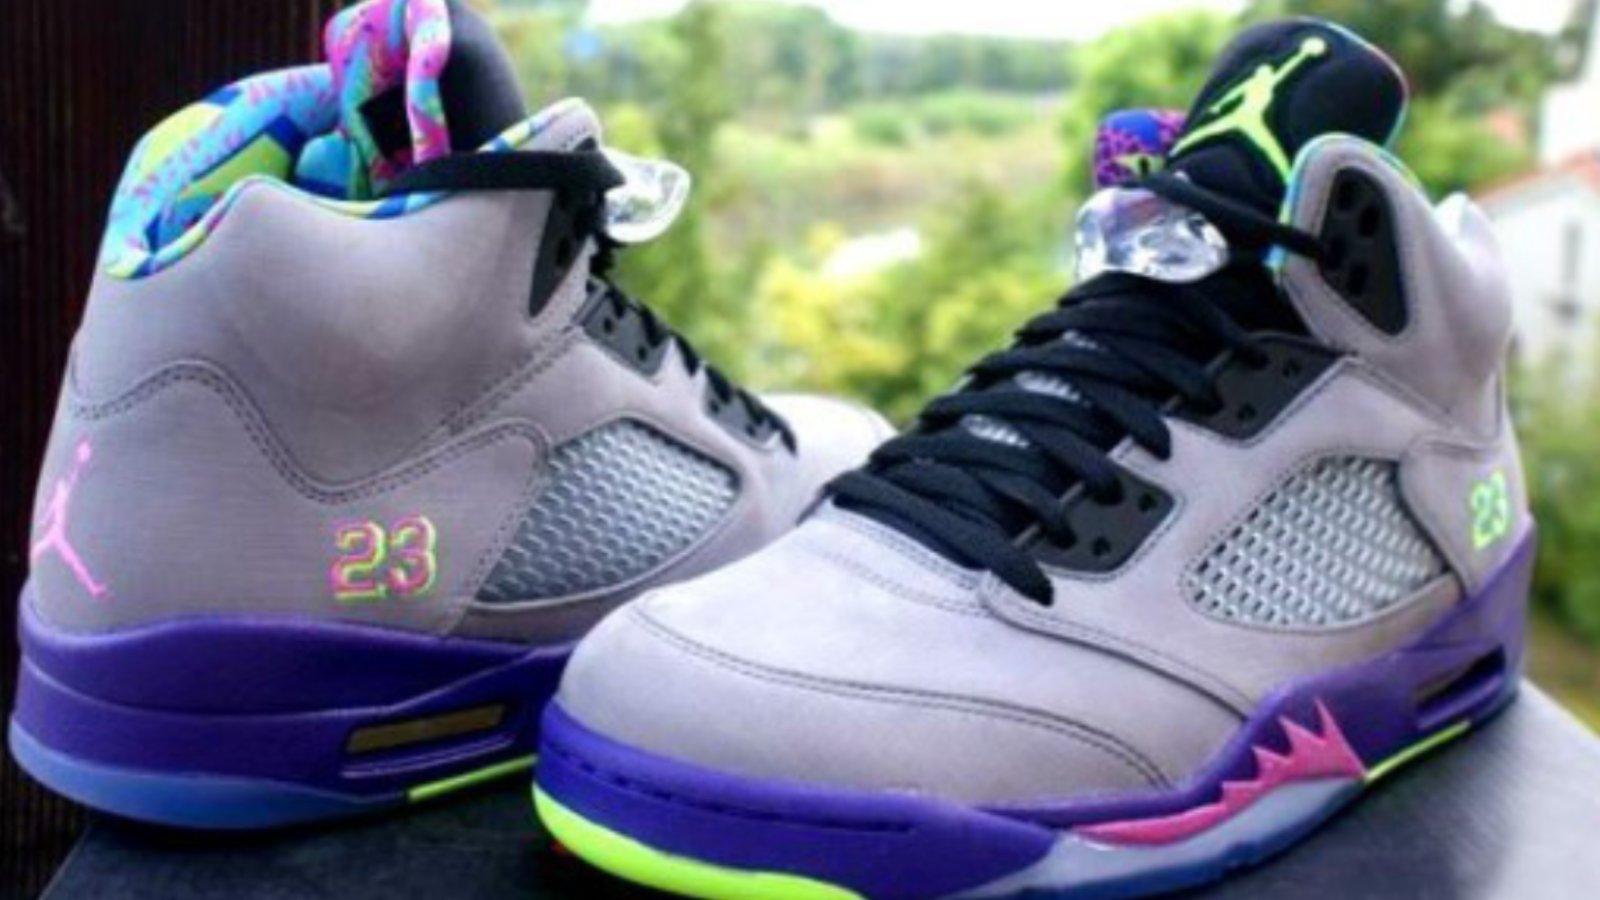 Nike Air Jordan Retro 5 Fresh Prince of